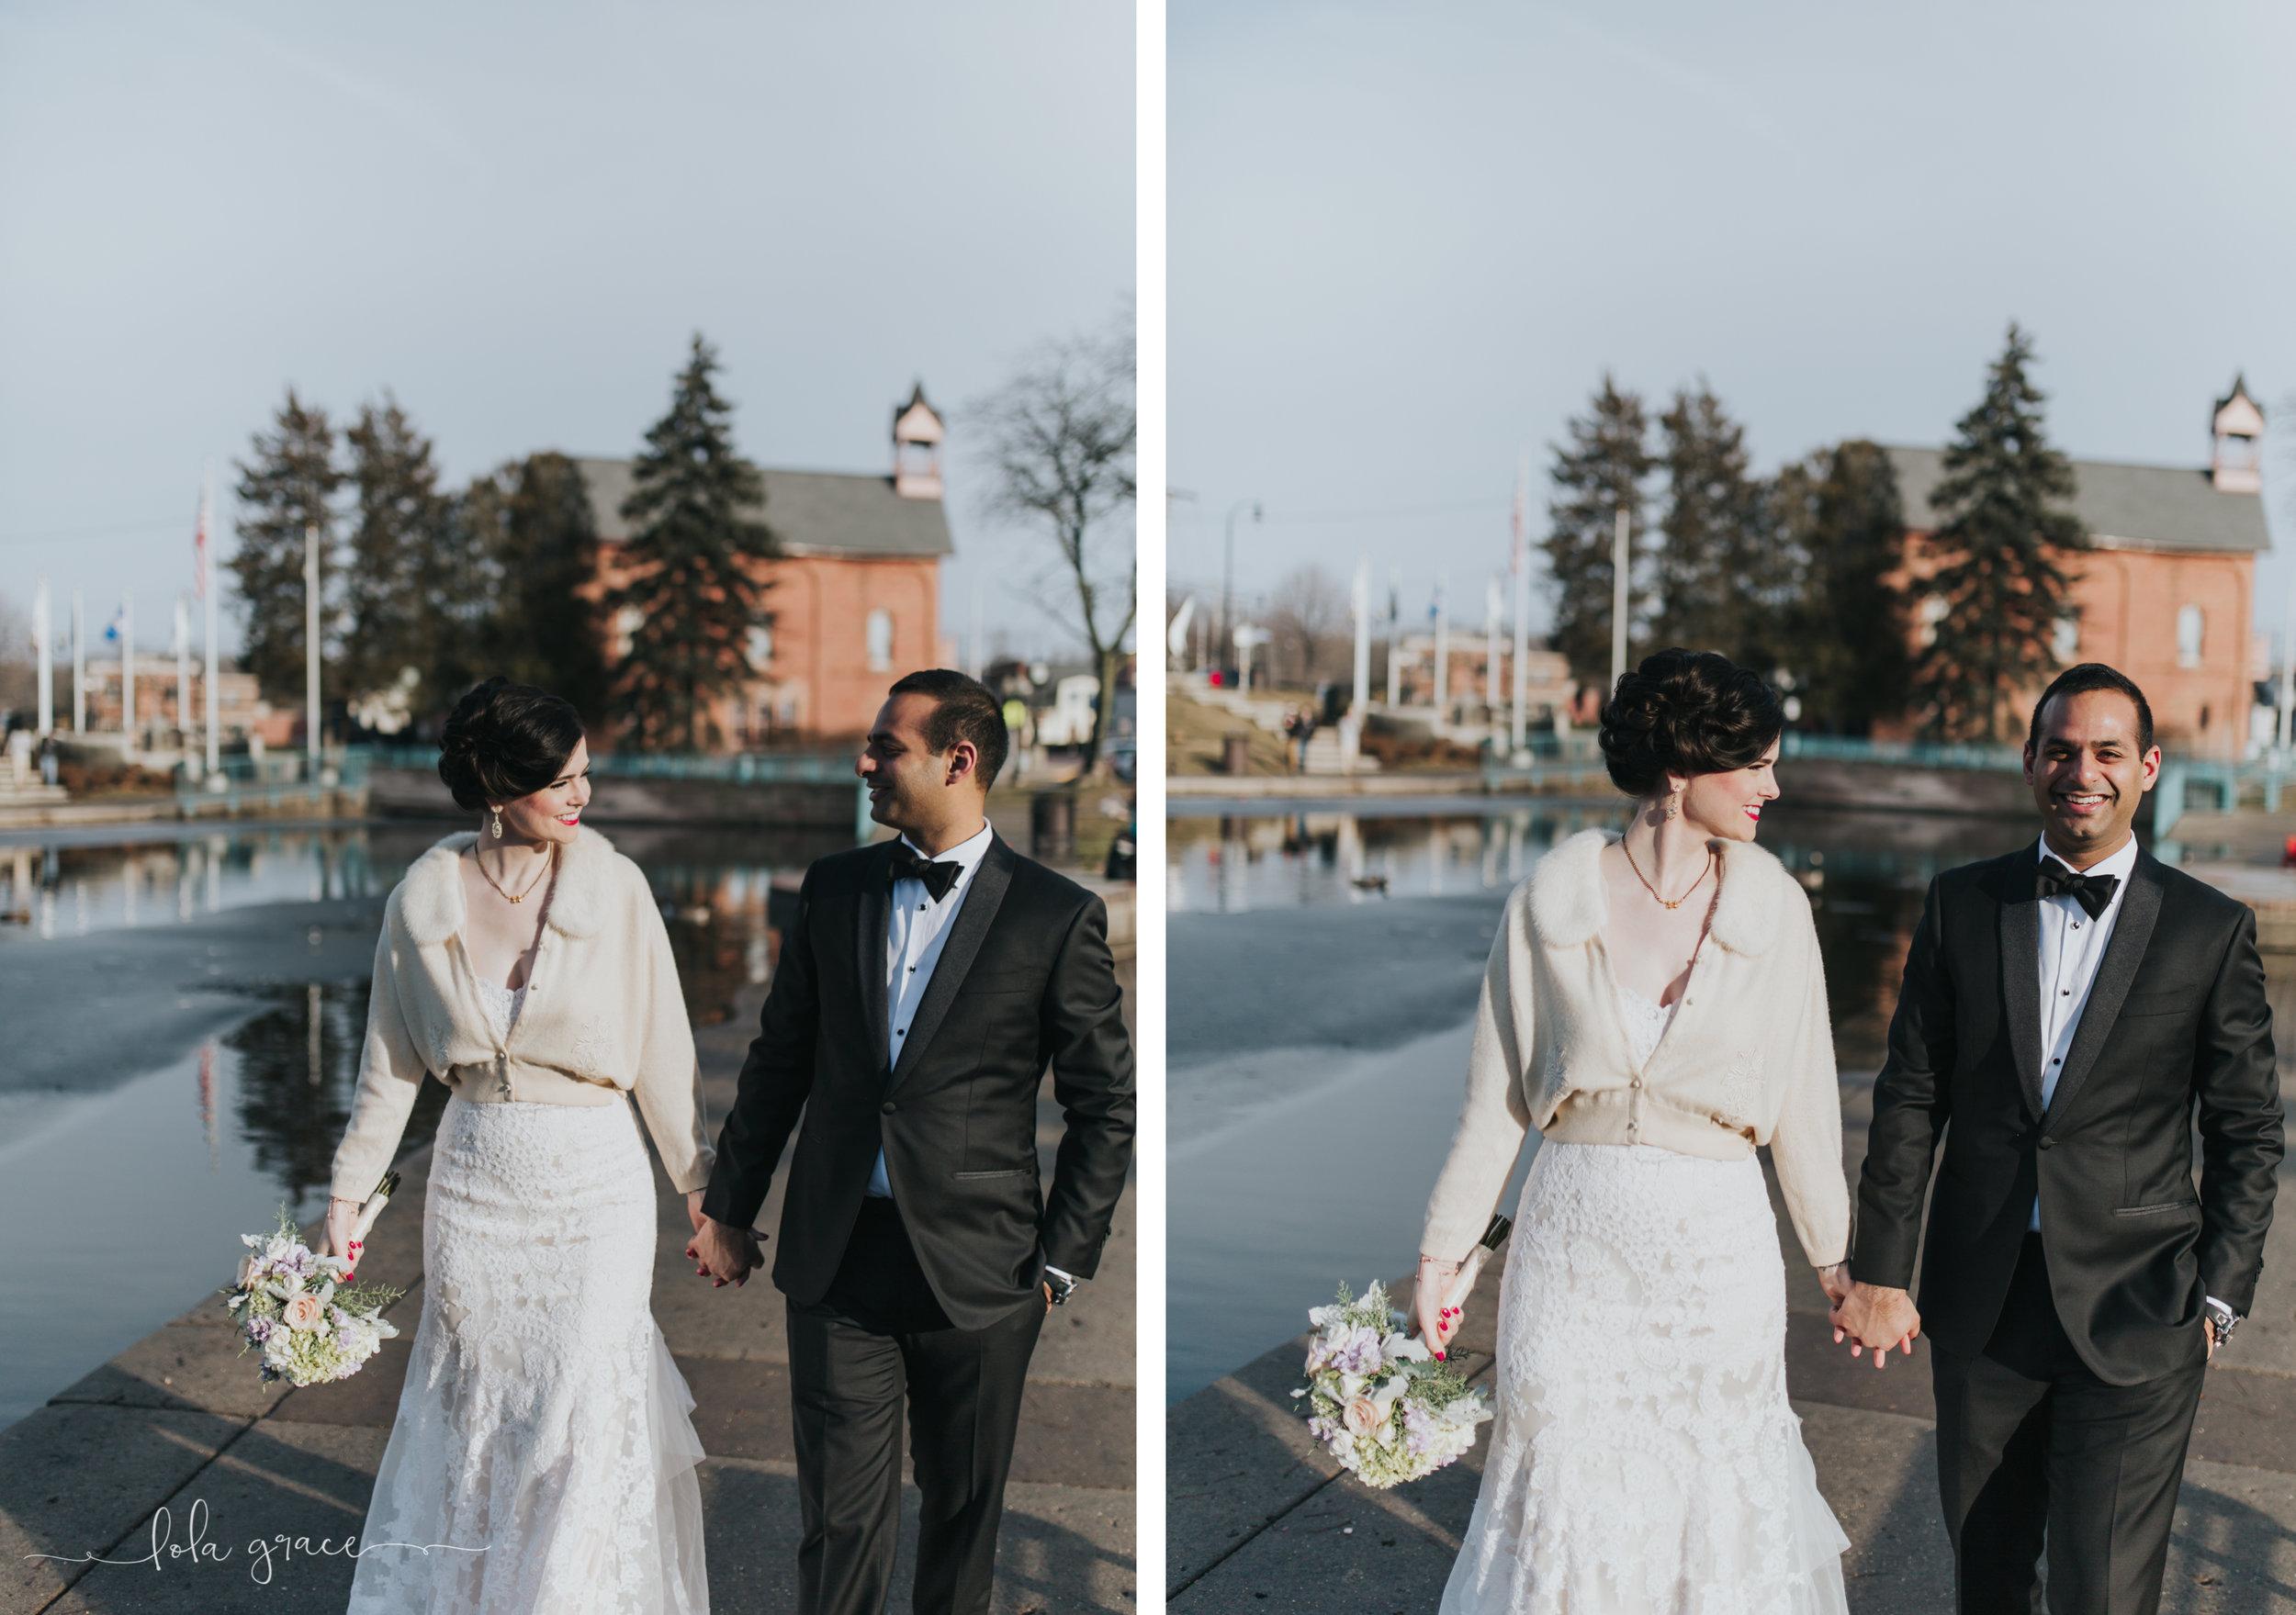 lola-grace-photography-erin-nik-brighton-mi-wedding-3.jpg